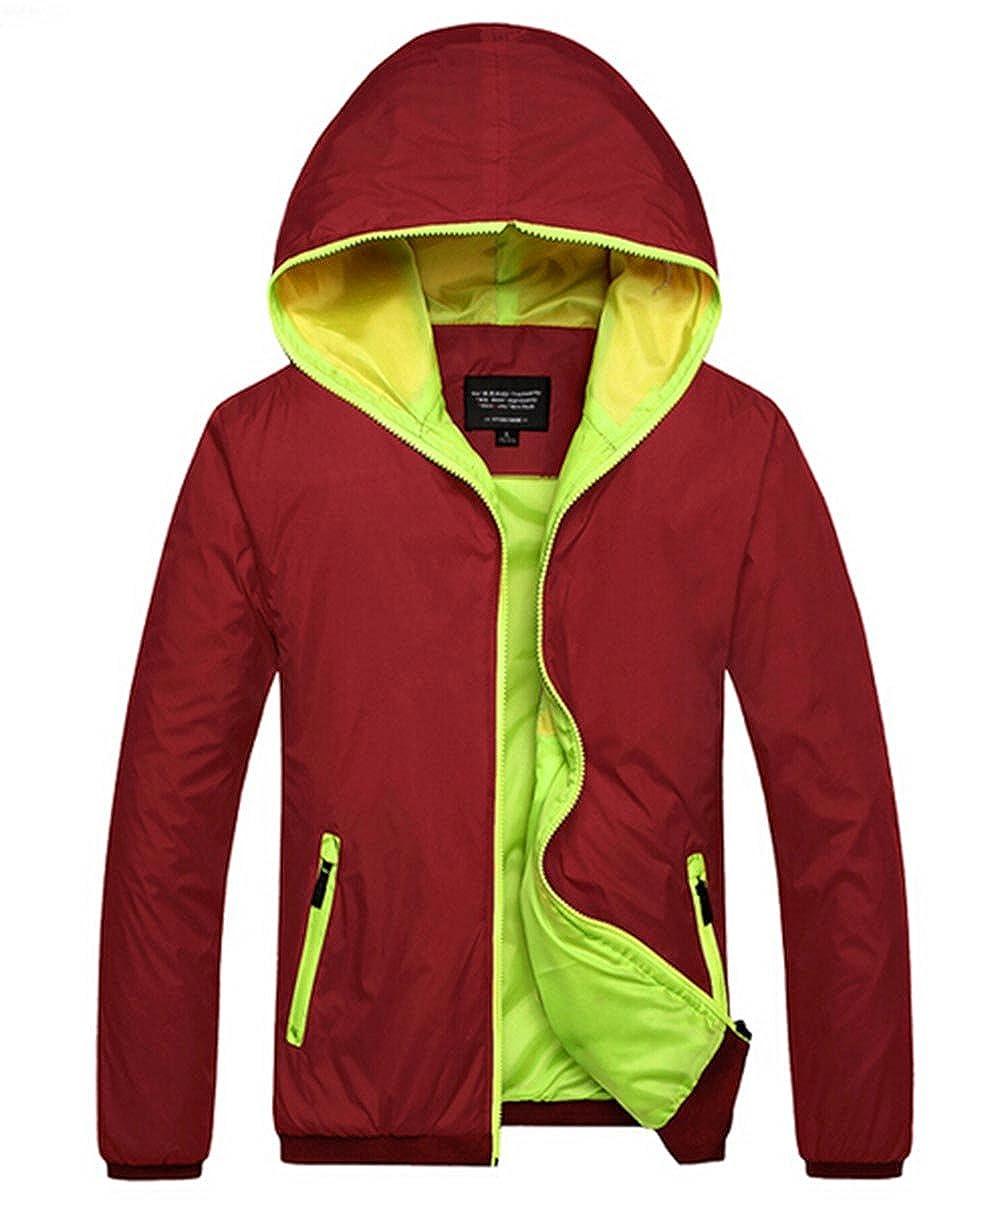 201a97cce Amazon.com  Amcupider Big Boys Hooded Rain Quick Dry Jacket ...